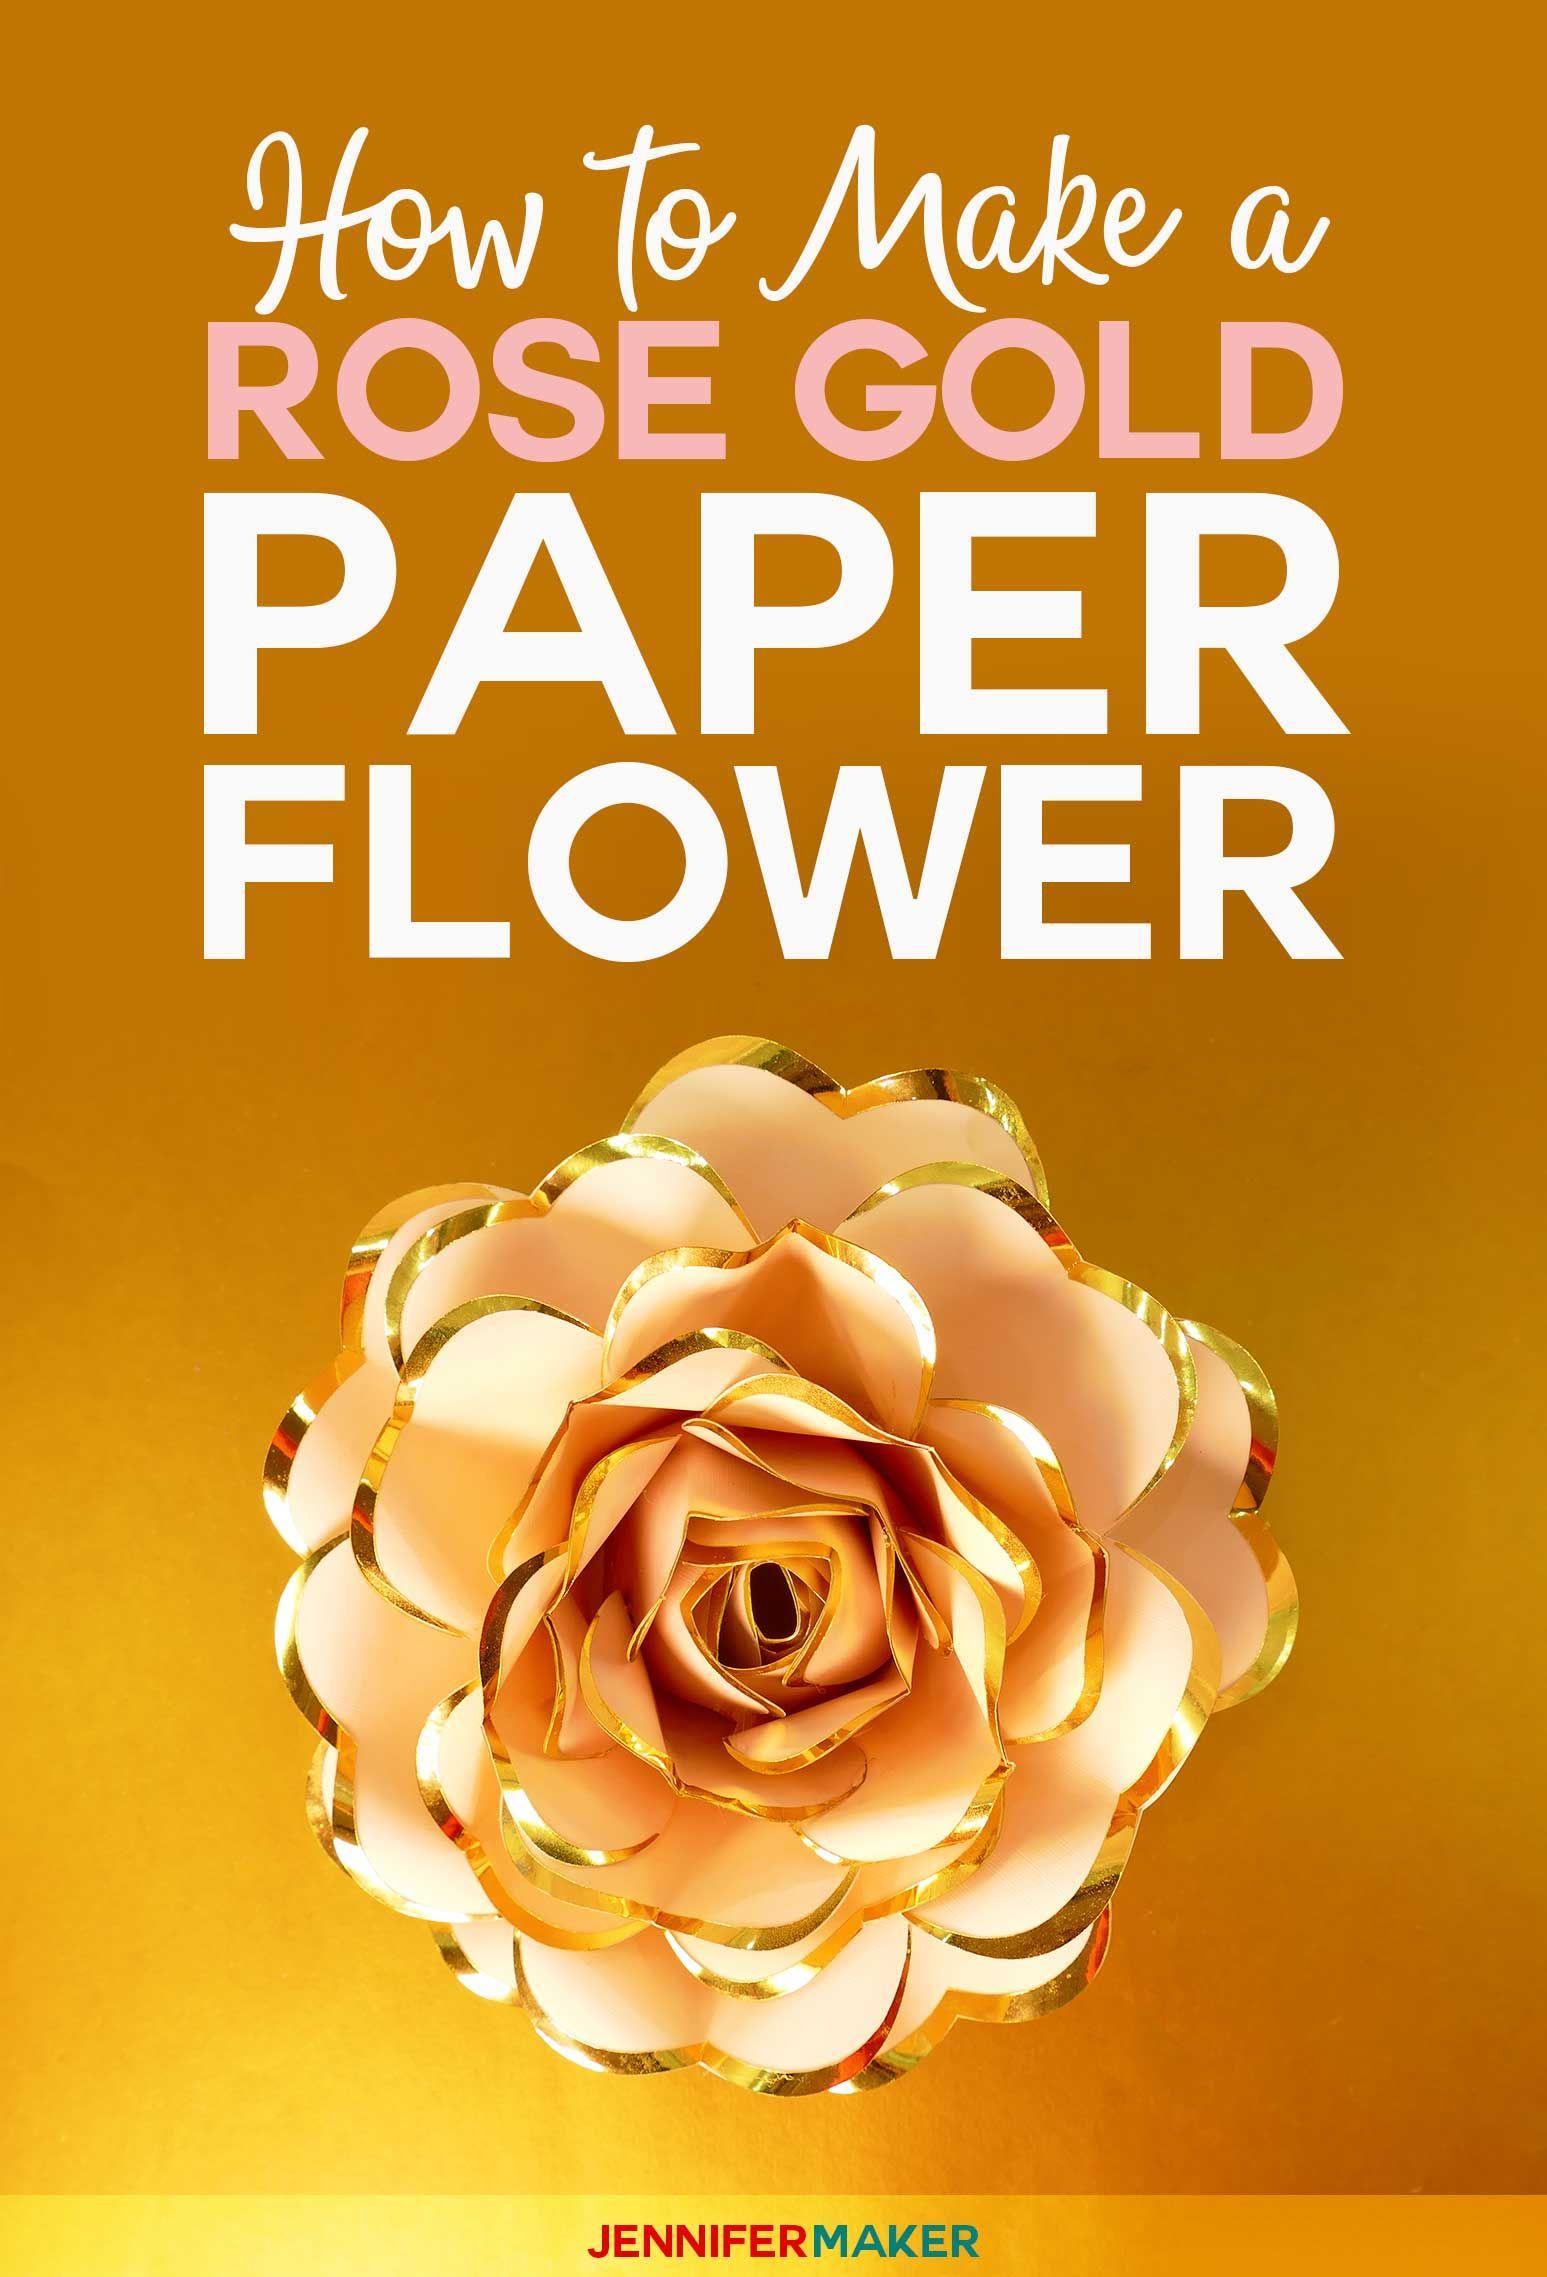 Rose Gold Paper Flower Foil Edged Heart Shaped Petals Paper